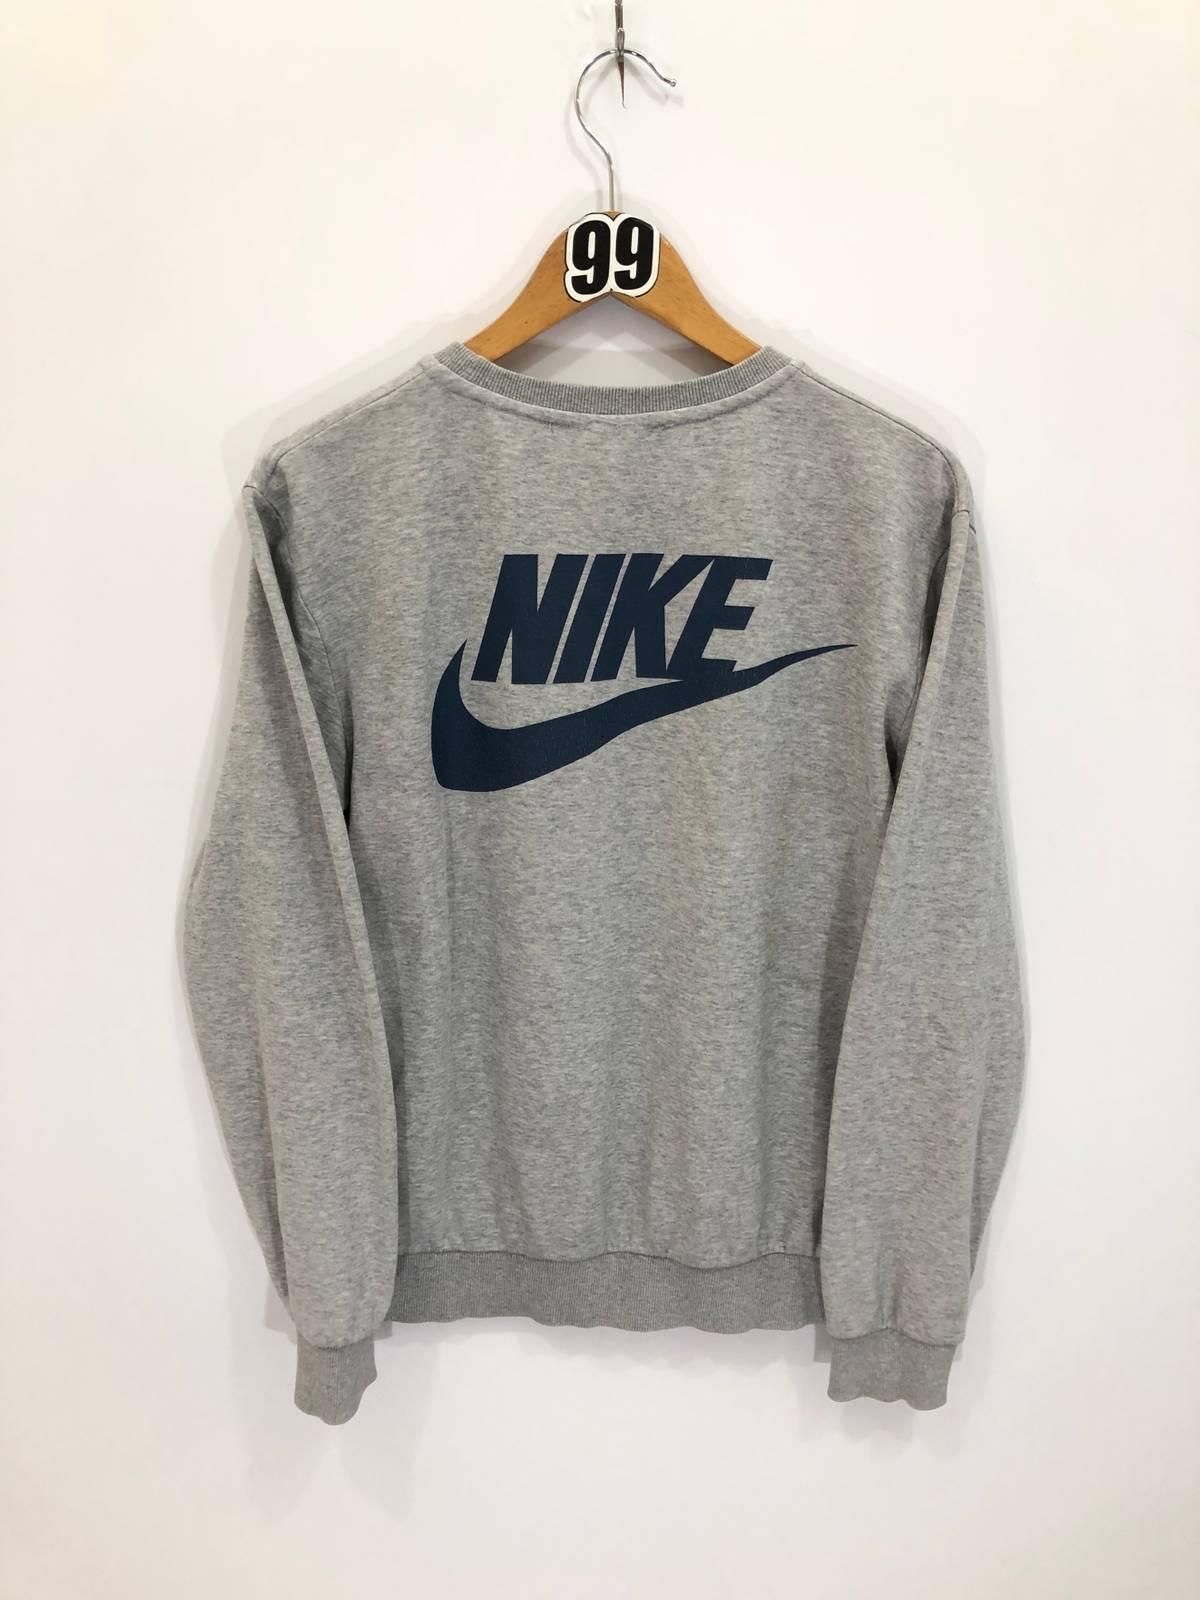 Nike Nike Air Max Sweatshirt Small Size #4067 3 160 Size S $39